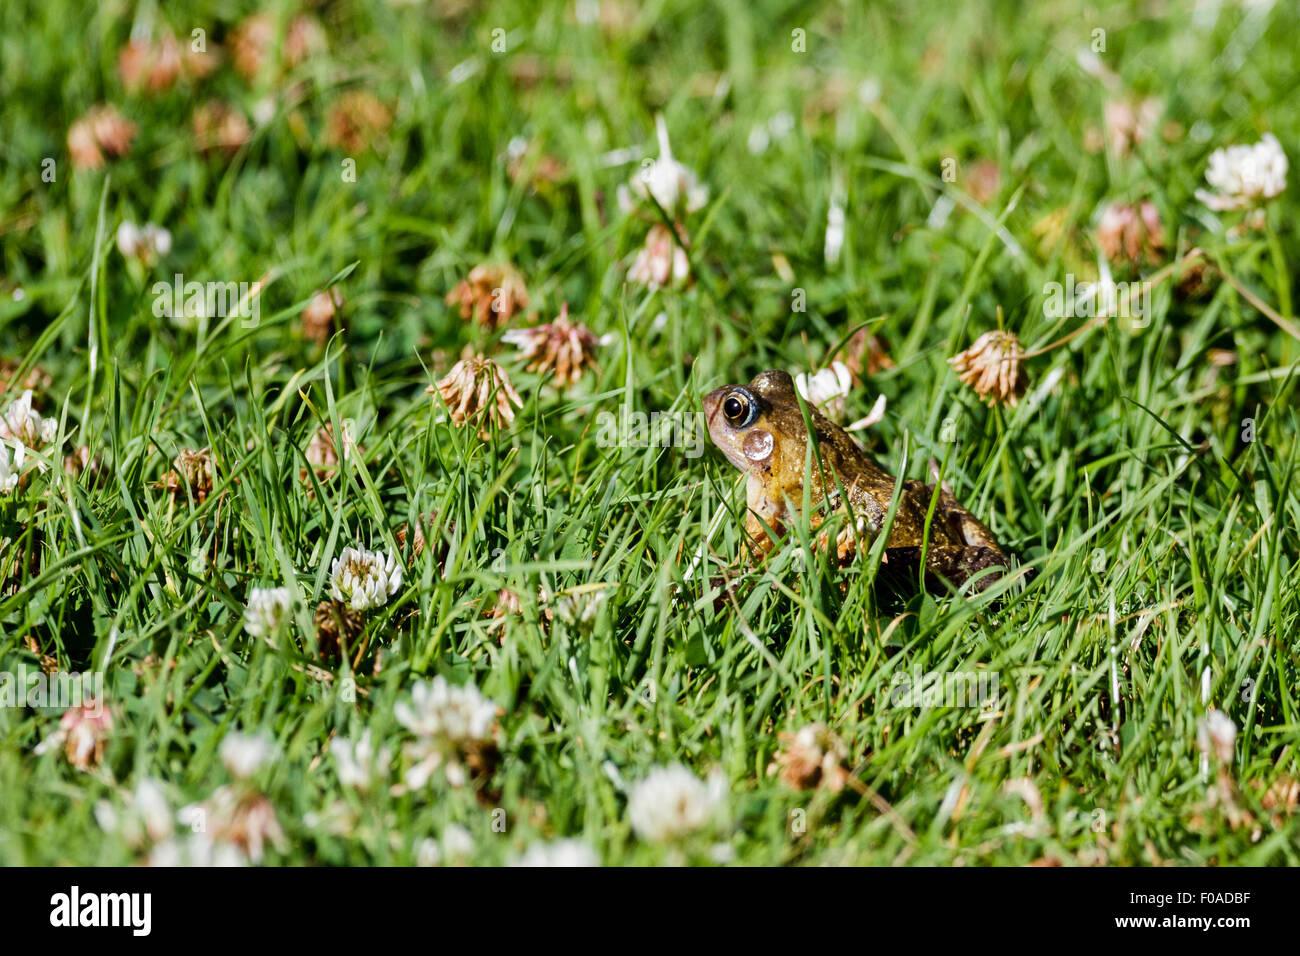 Common frog (Rana temporaria) East Sussex garden, UK - Stock Image